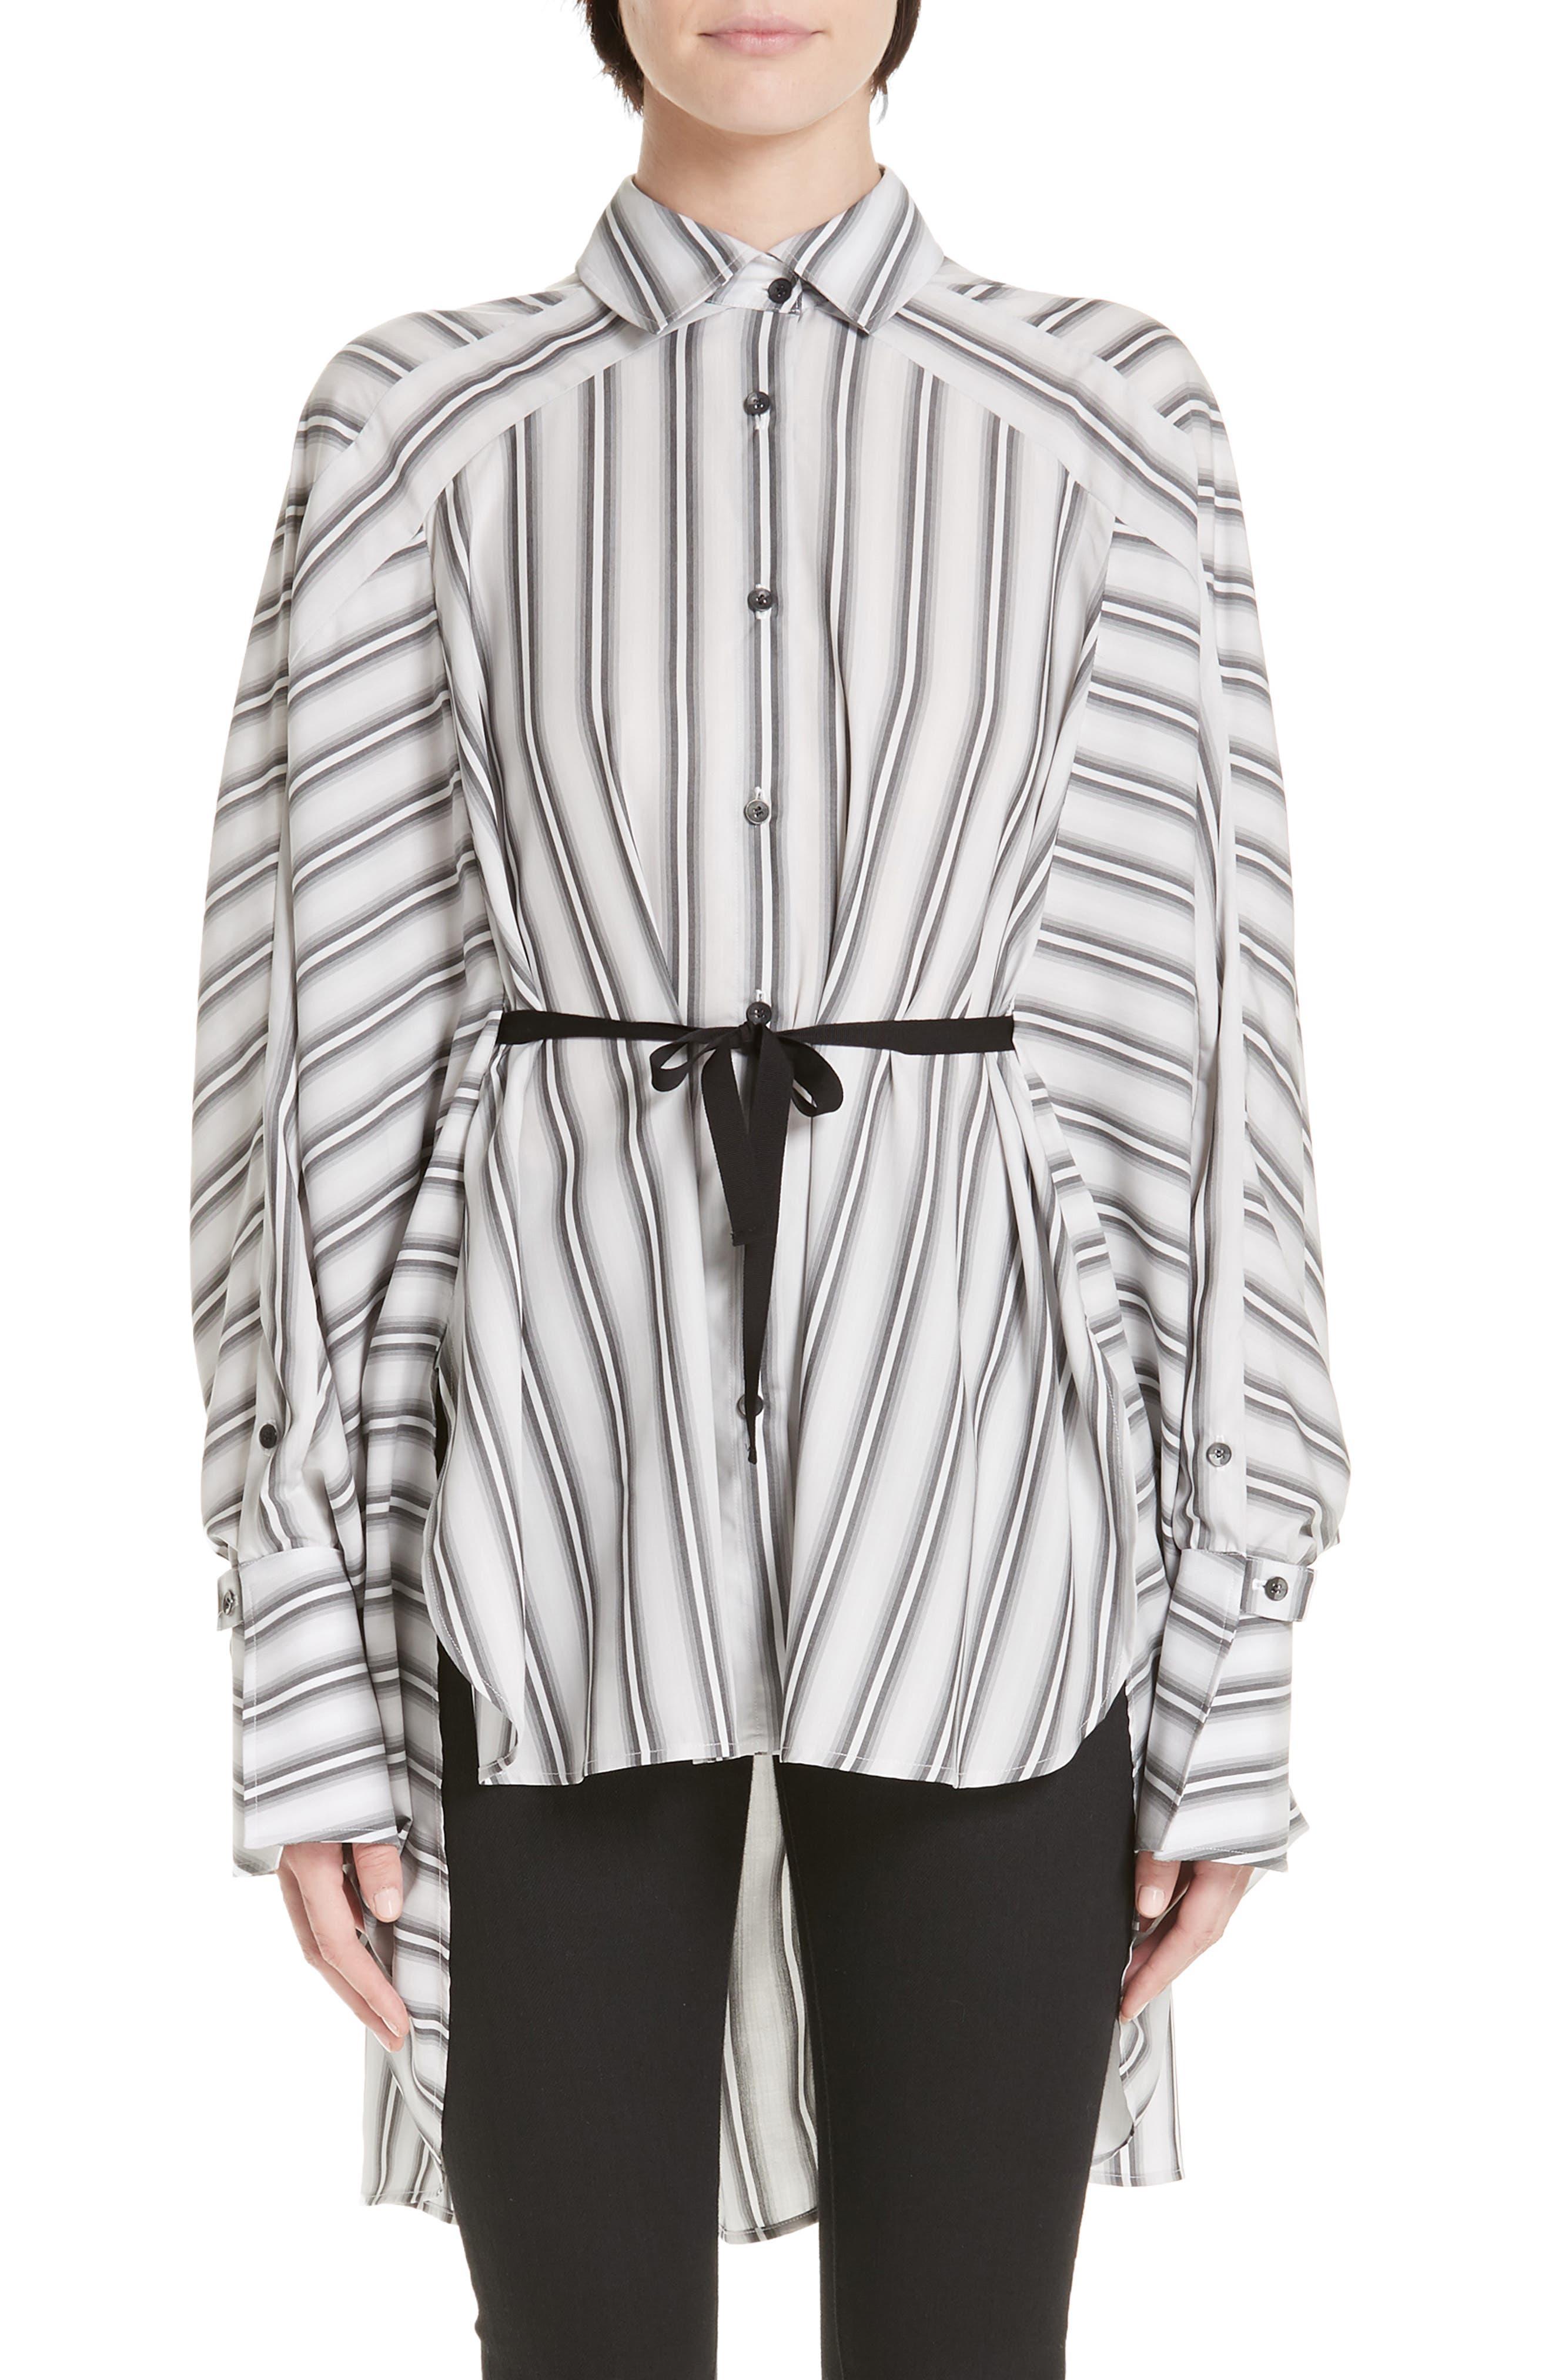 PALMER/HARDING Streep Stripe Shirt, Main, color, GRADIENT STRIPE WITH BLACK